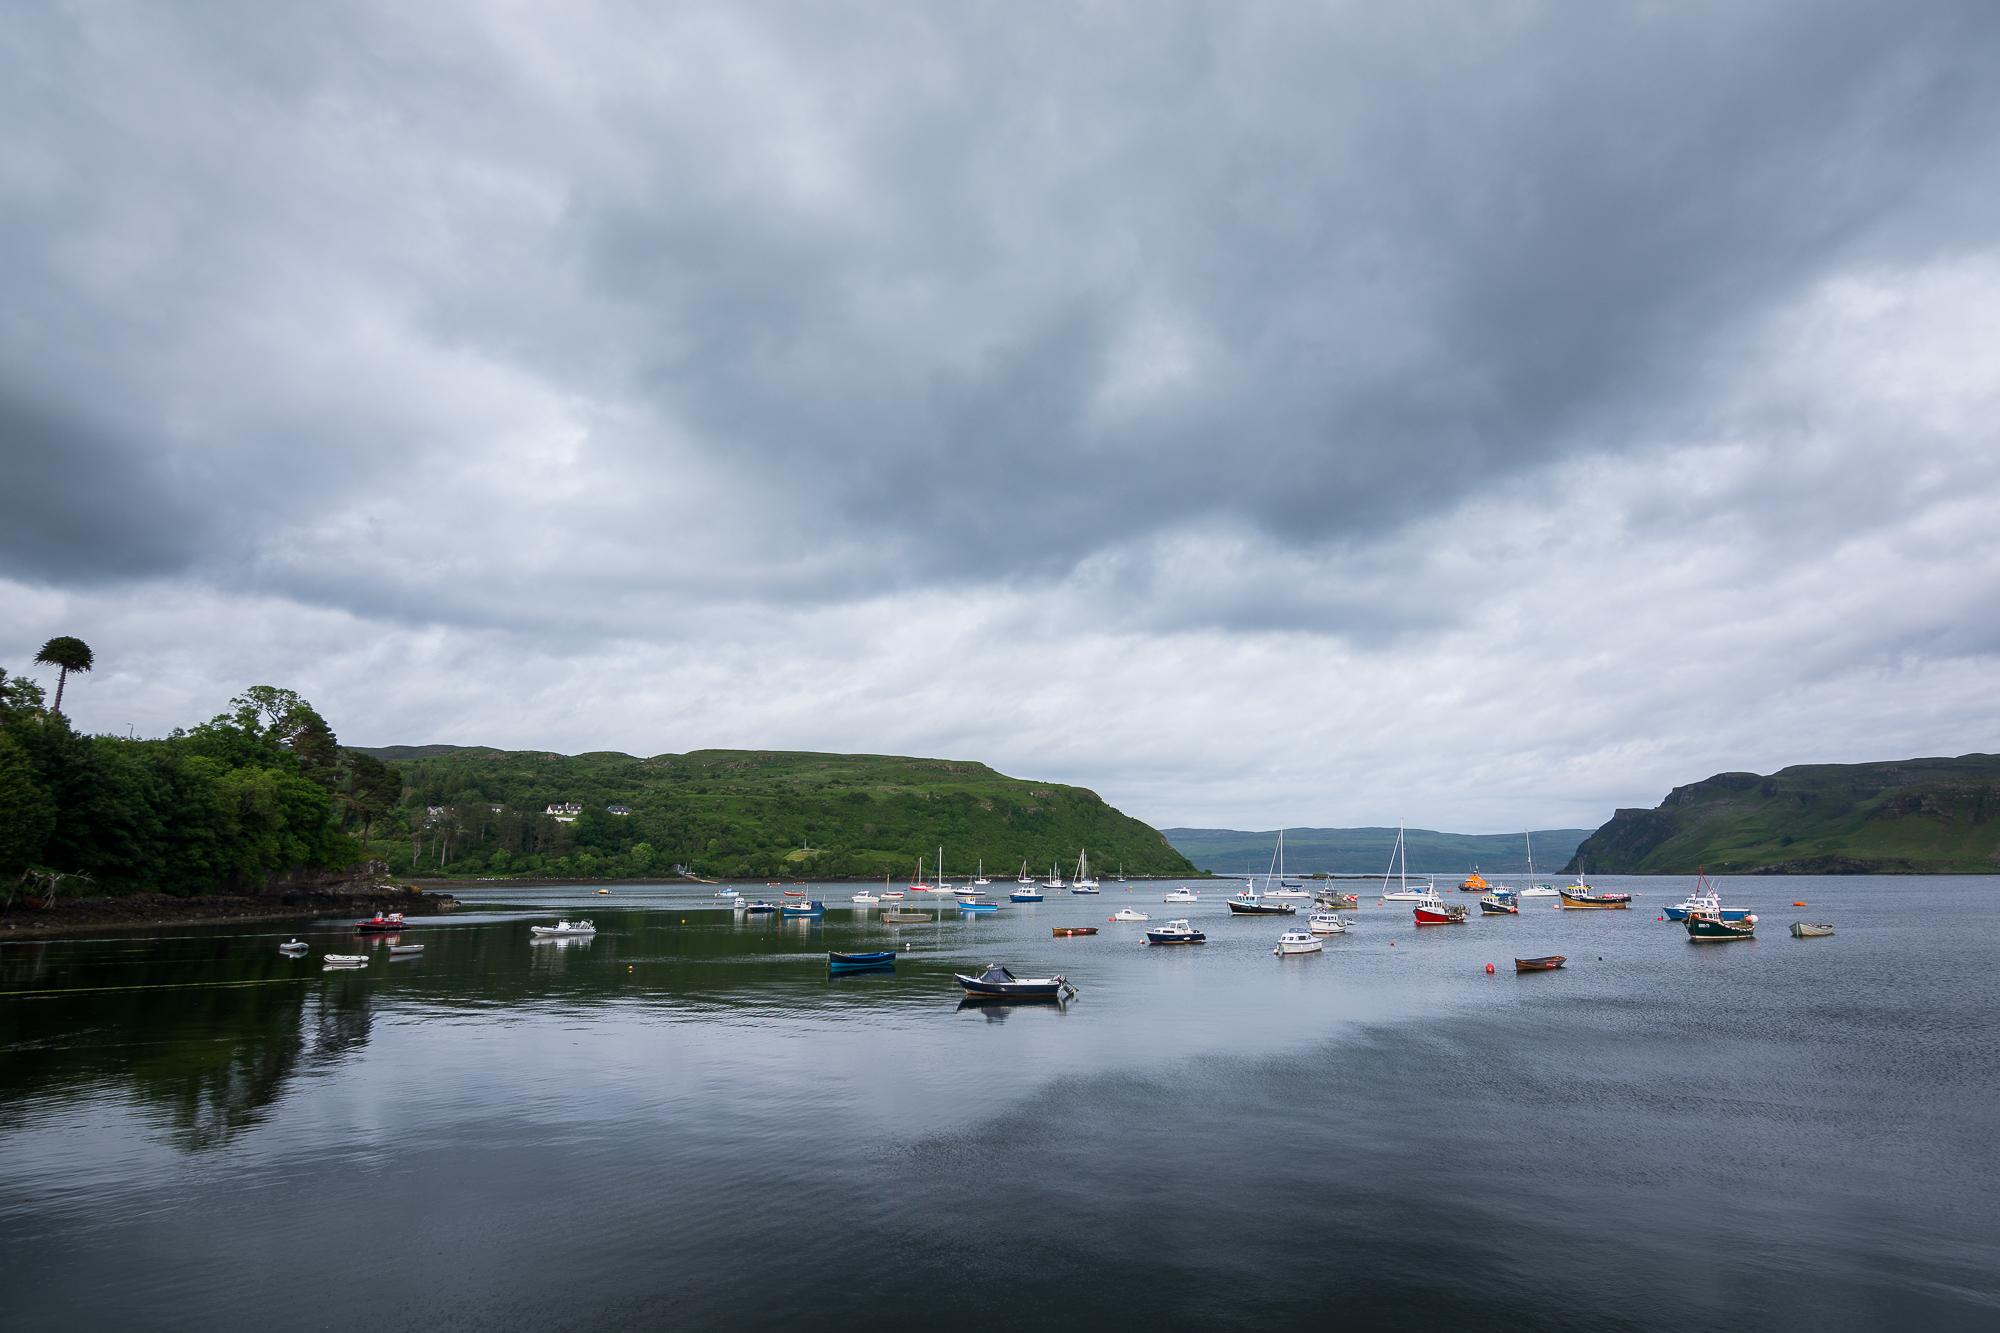 Portree, Isle of Skye - Scotland, 2014